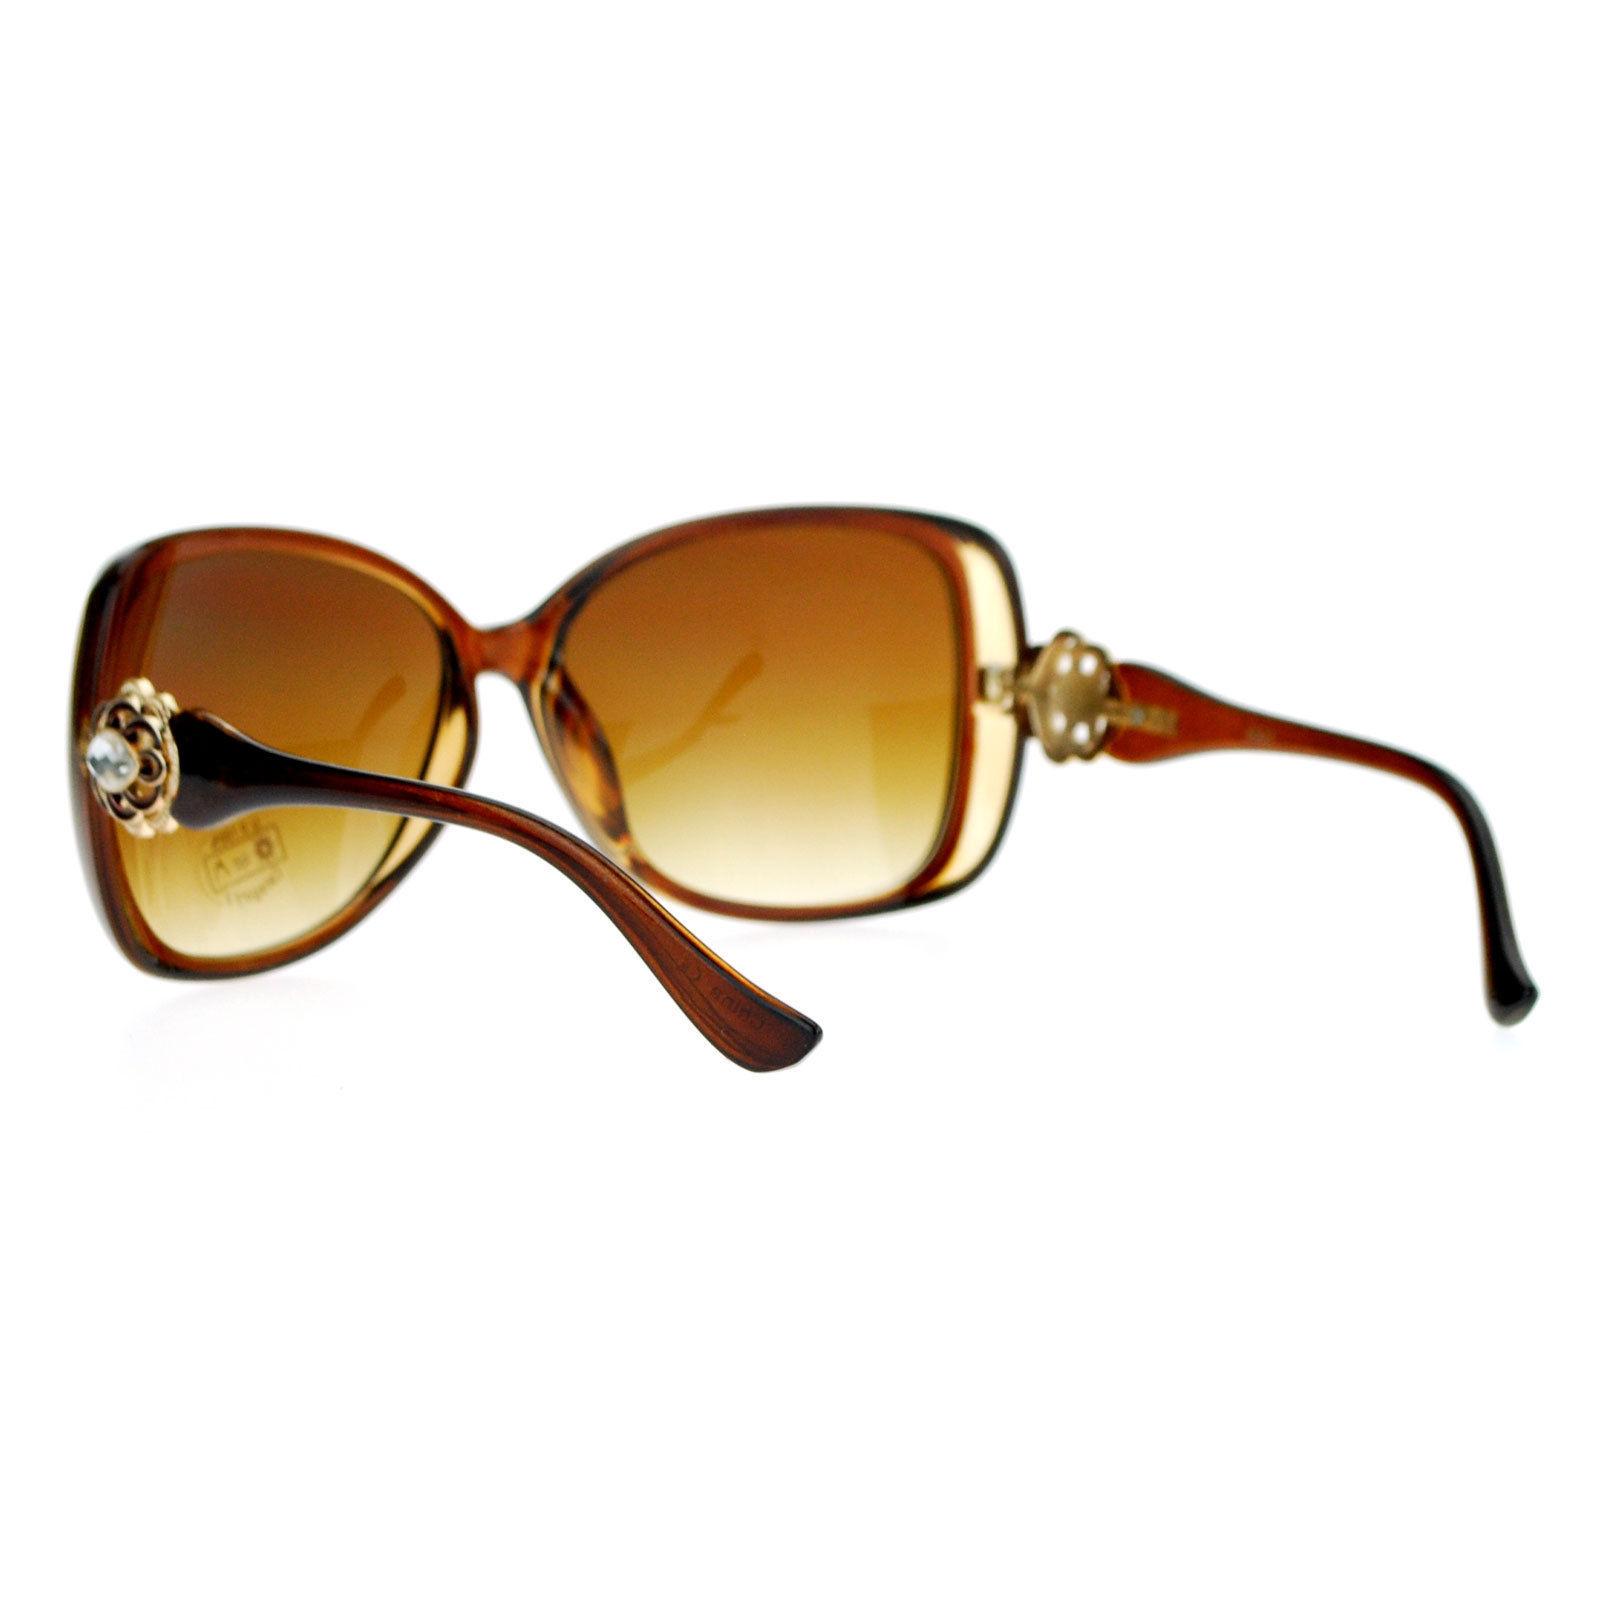 Vintage Jewel Design Sunglasses Womens Oversized Square Fashion Shades